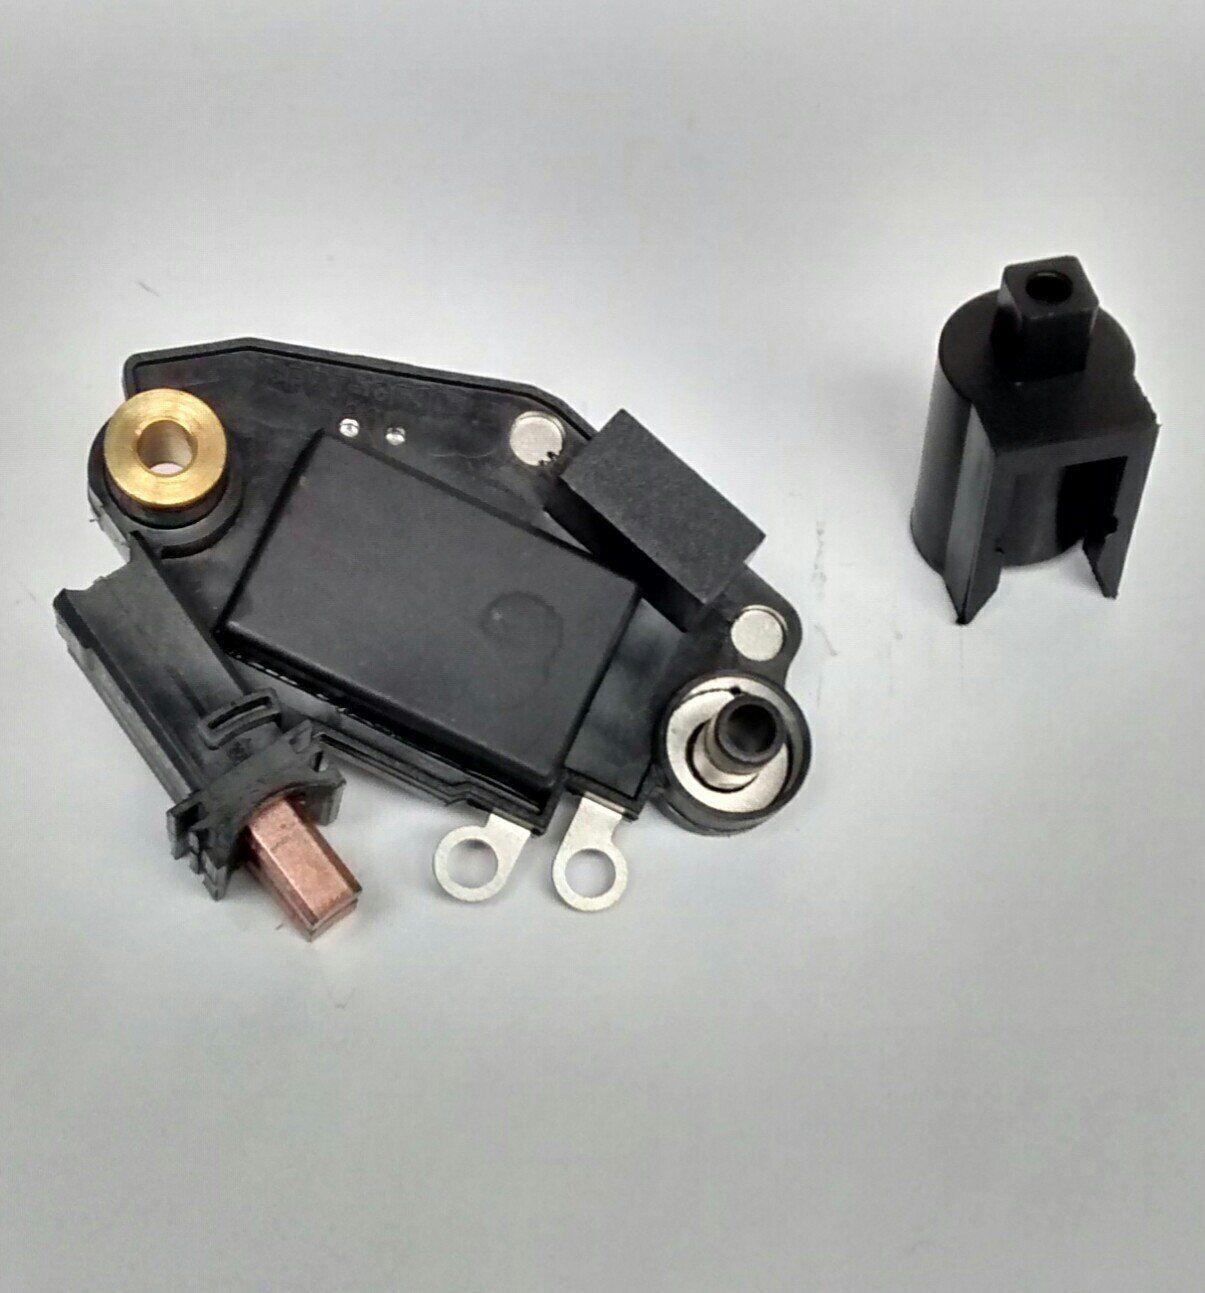 12v Alternator Voltage Regulator Brush Box Renault Espace